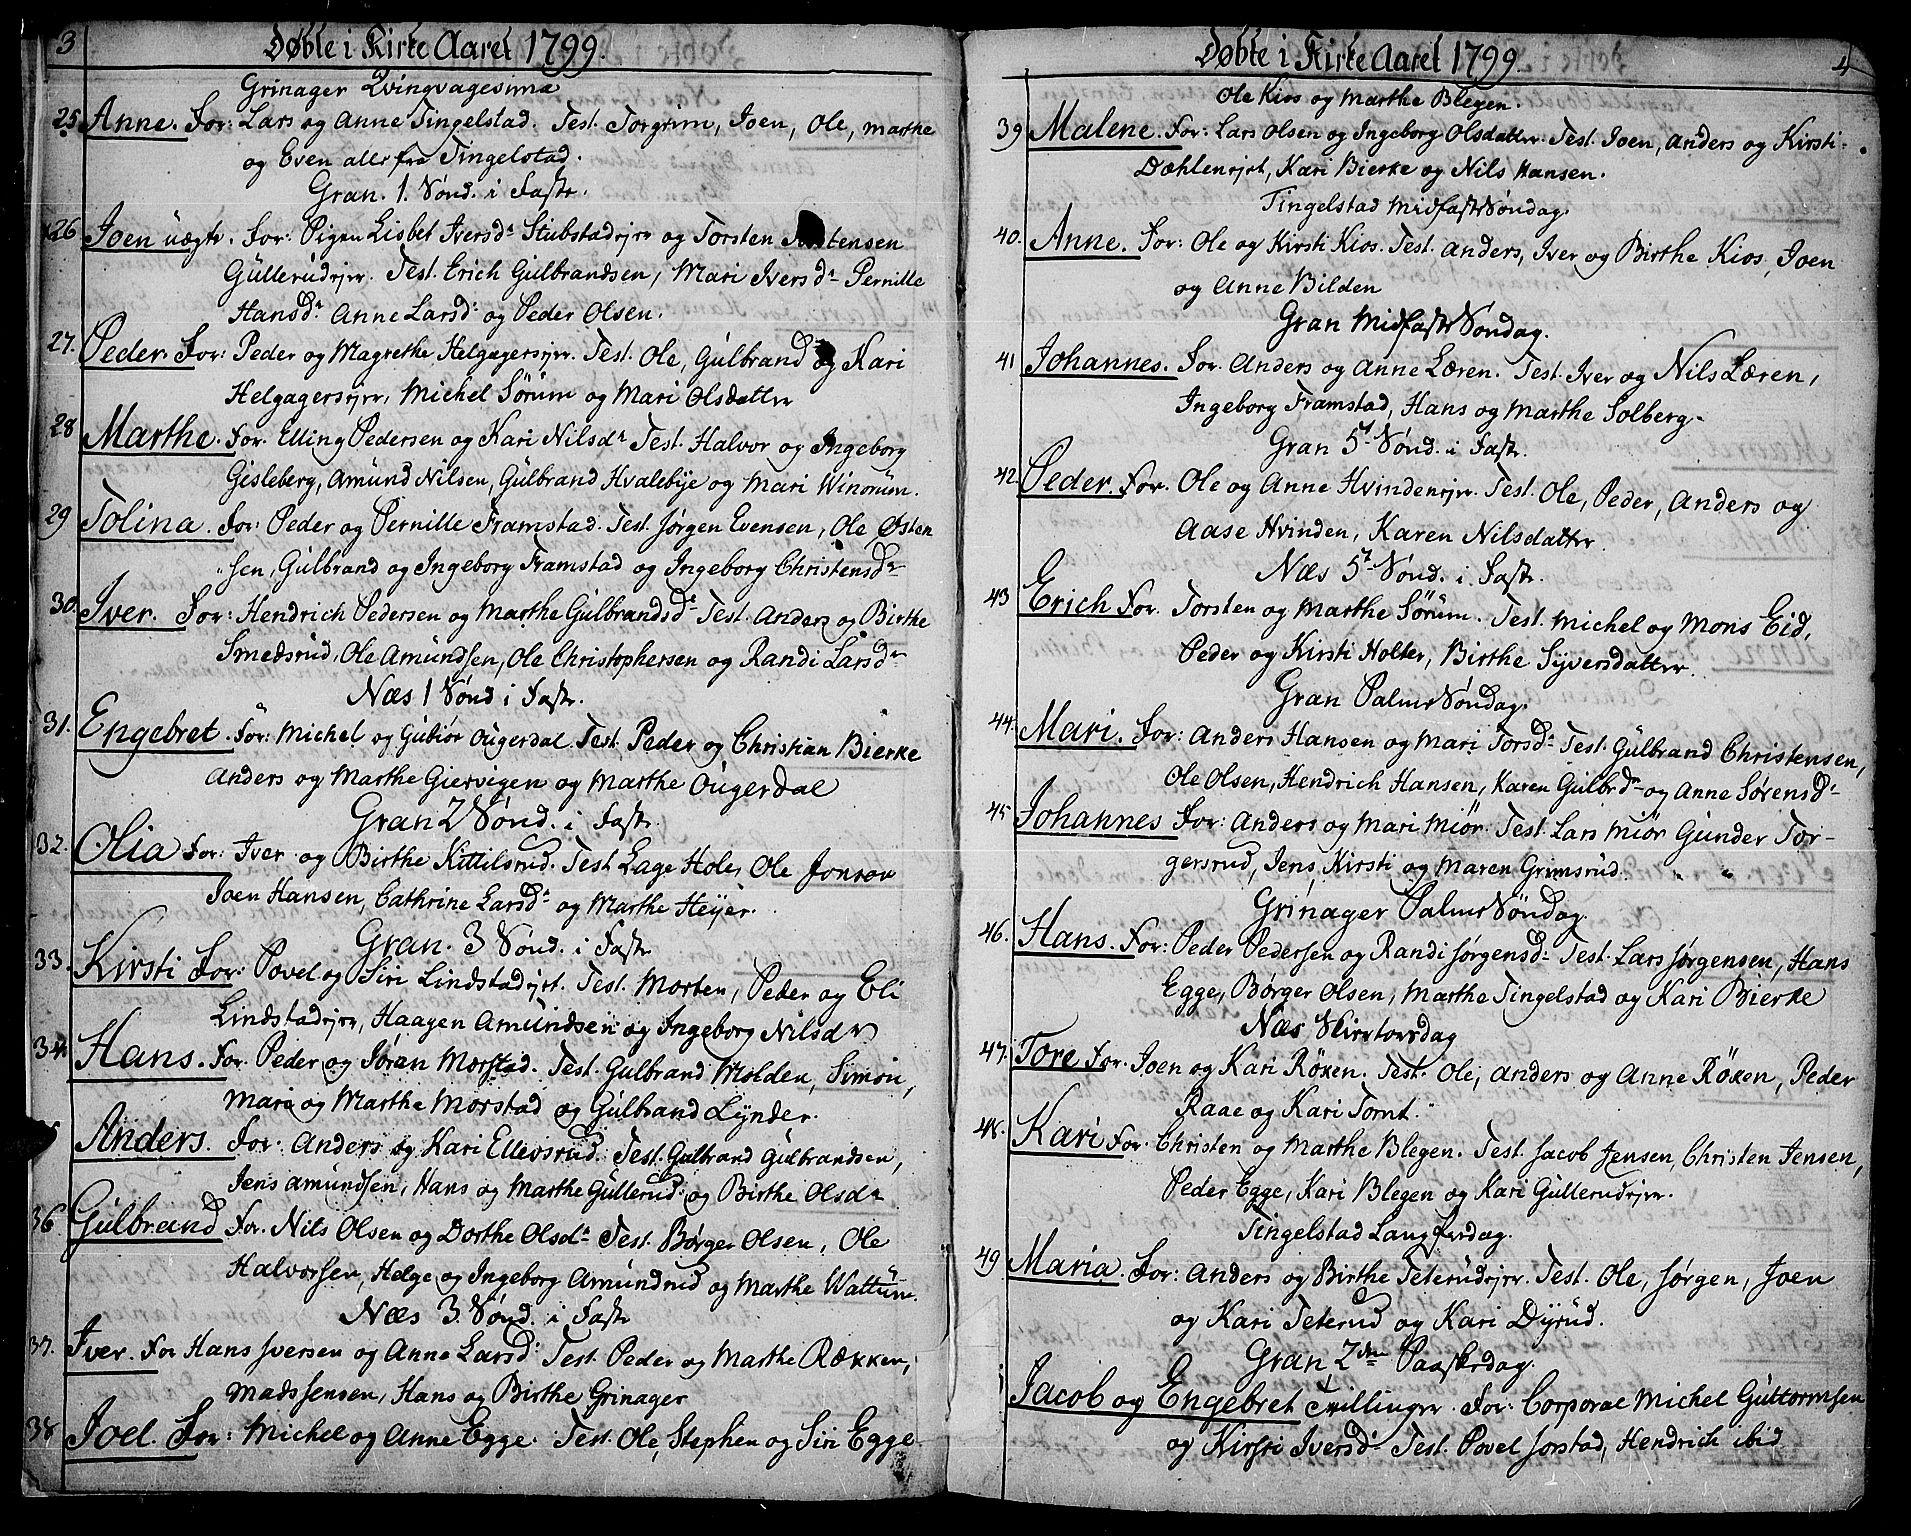 SAH, Gran prestekontor, Ministerialbok nr. 8, 1798-1811, s. 3-4